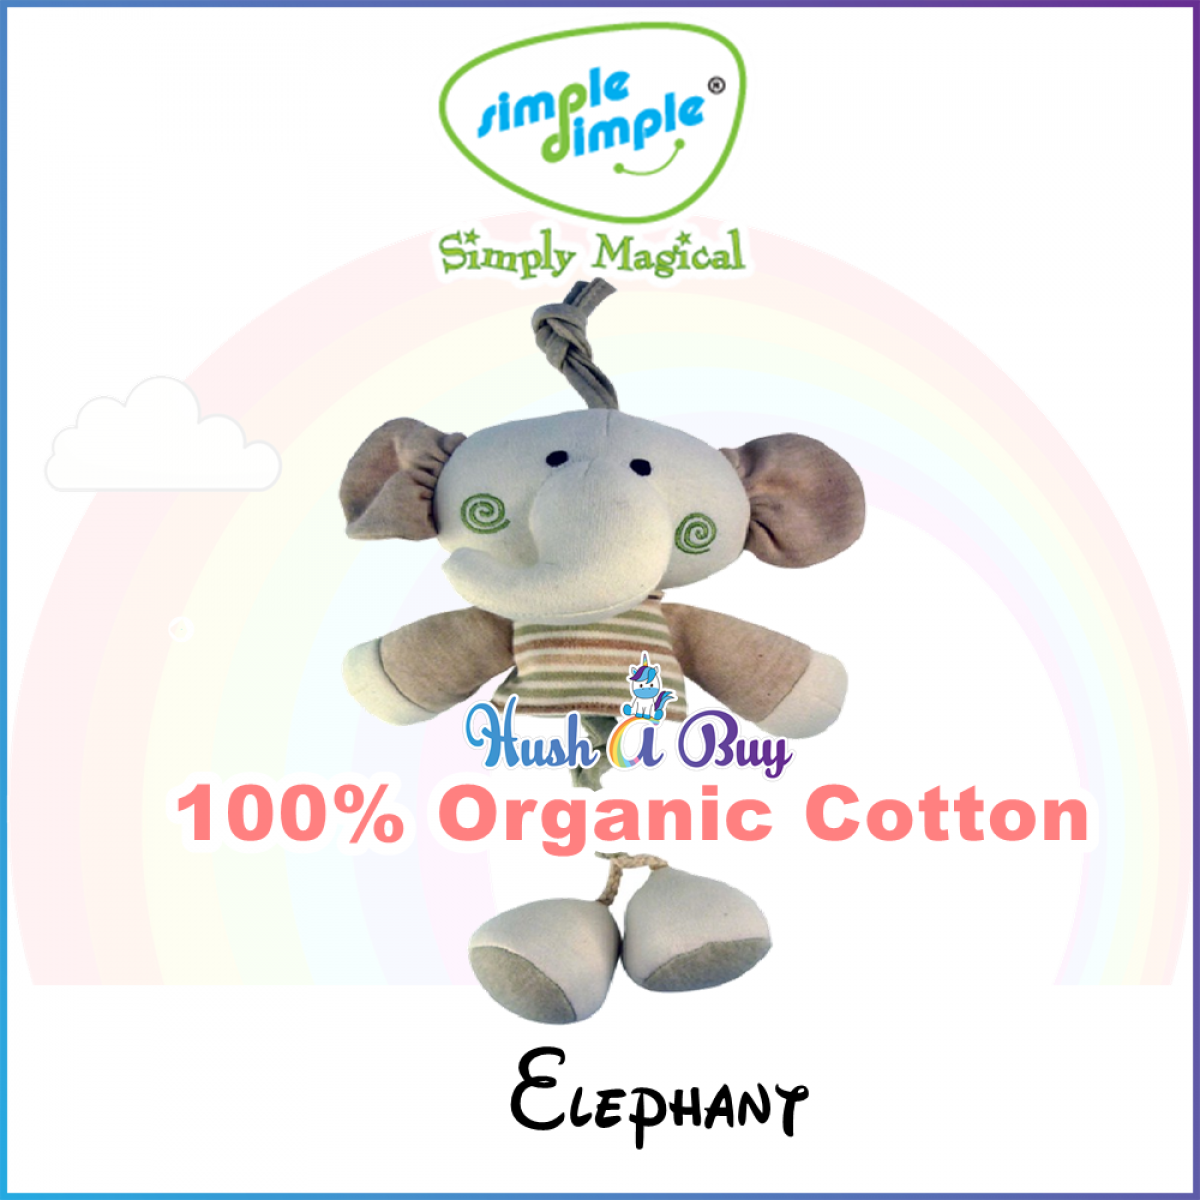 Simple Dimple Organic Stuffed Squek Pull String Vibrating Toys